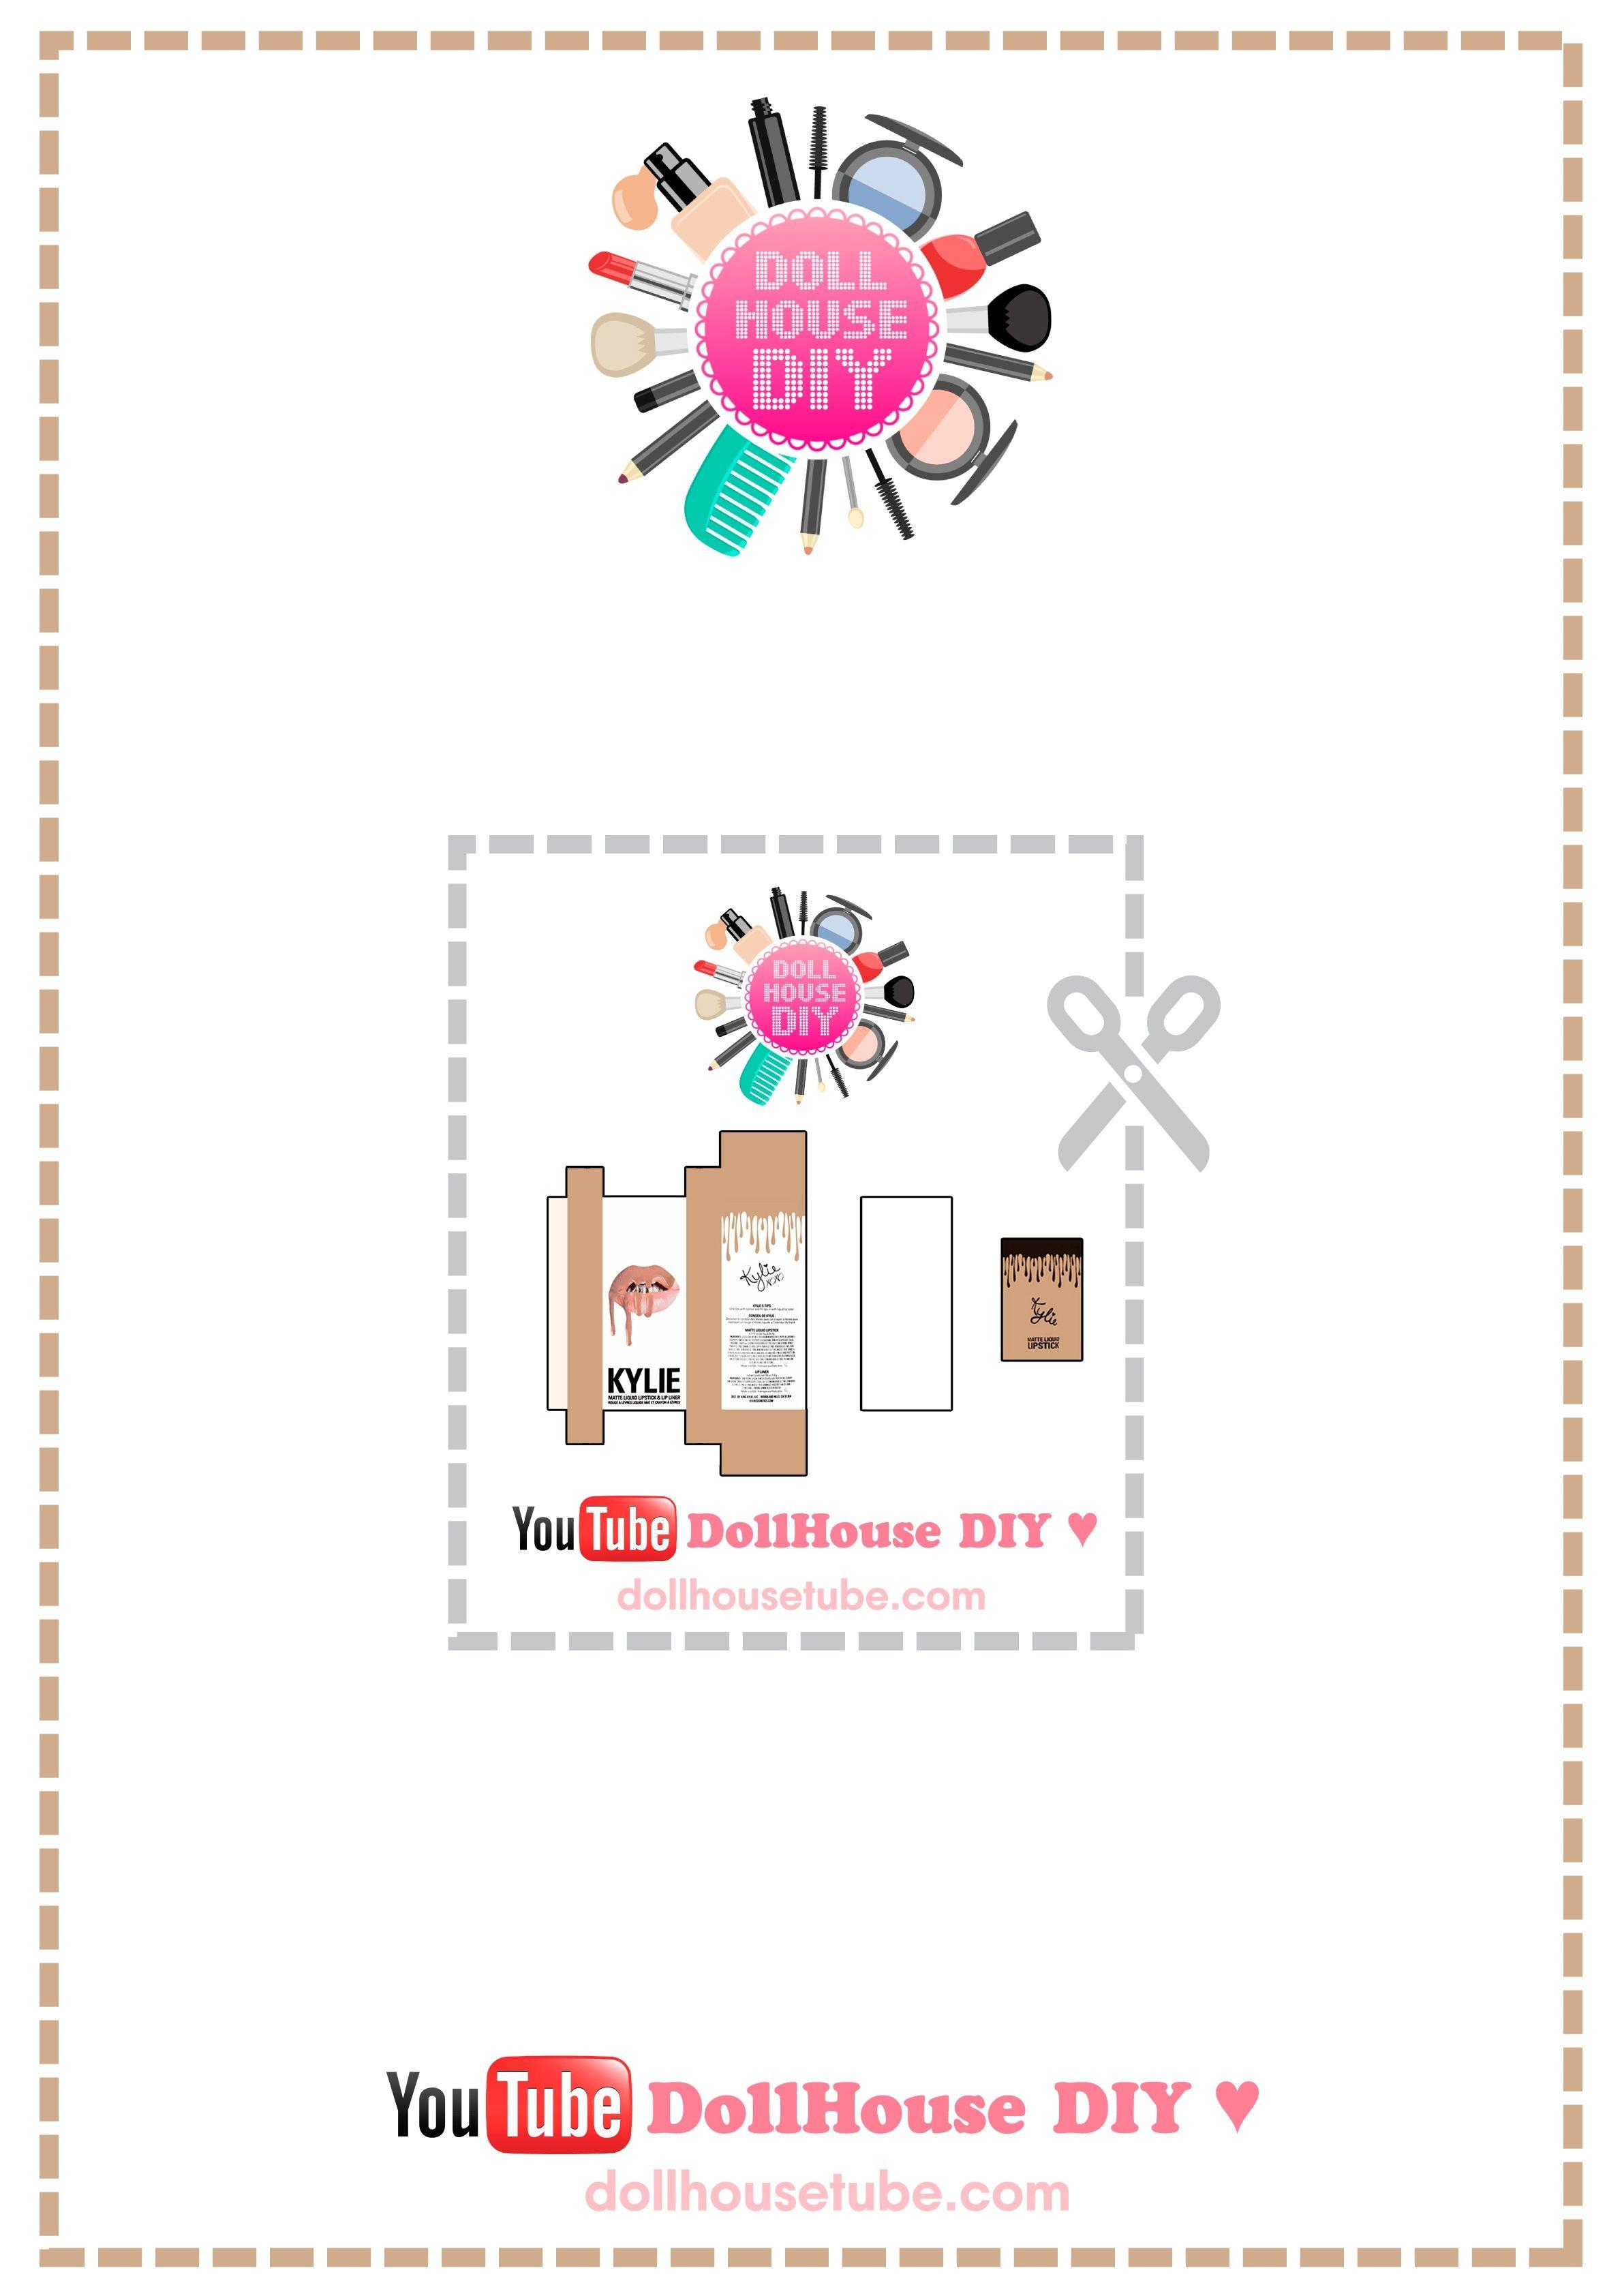 Calendario Abril 2017 Para Imprimir Más Populares Realistic Miniature Lip Kit by Kylie Jenner Tutorial Dollhouse Diy Of Calendario Abril 2017 Para Imprimir Más Caliente Observar Calendario Para Imprimir 2019 Pdf